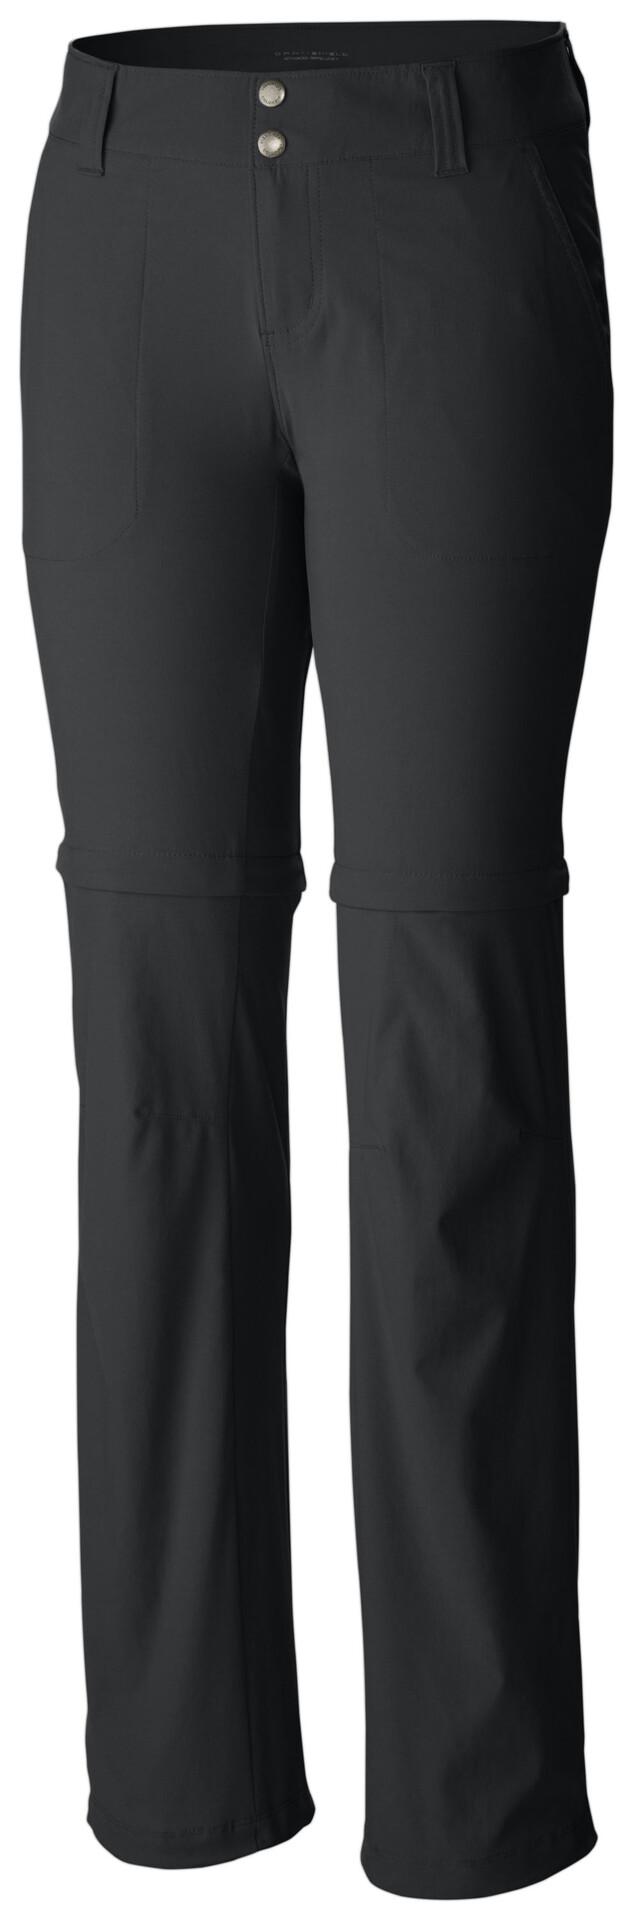 Pantalon convertible Columbia Saturday Trail II noir femme